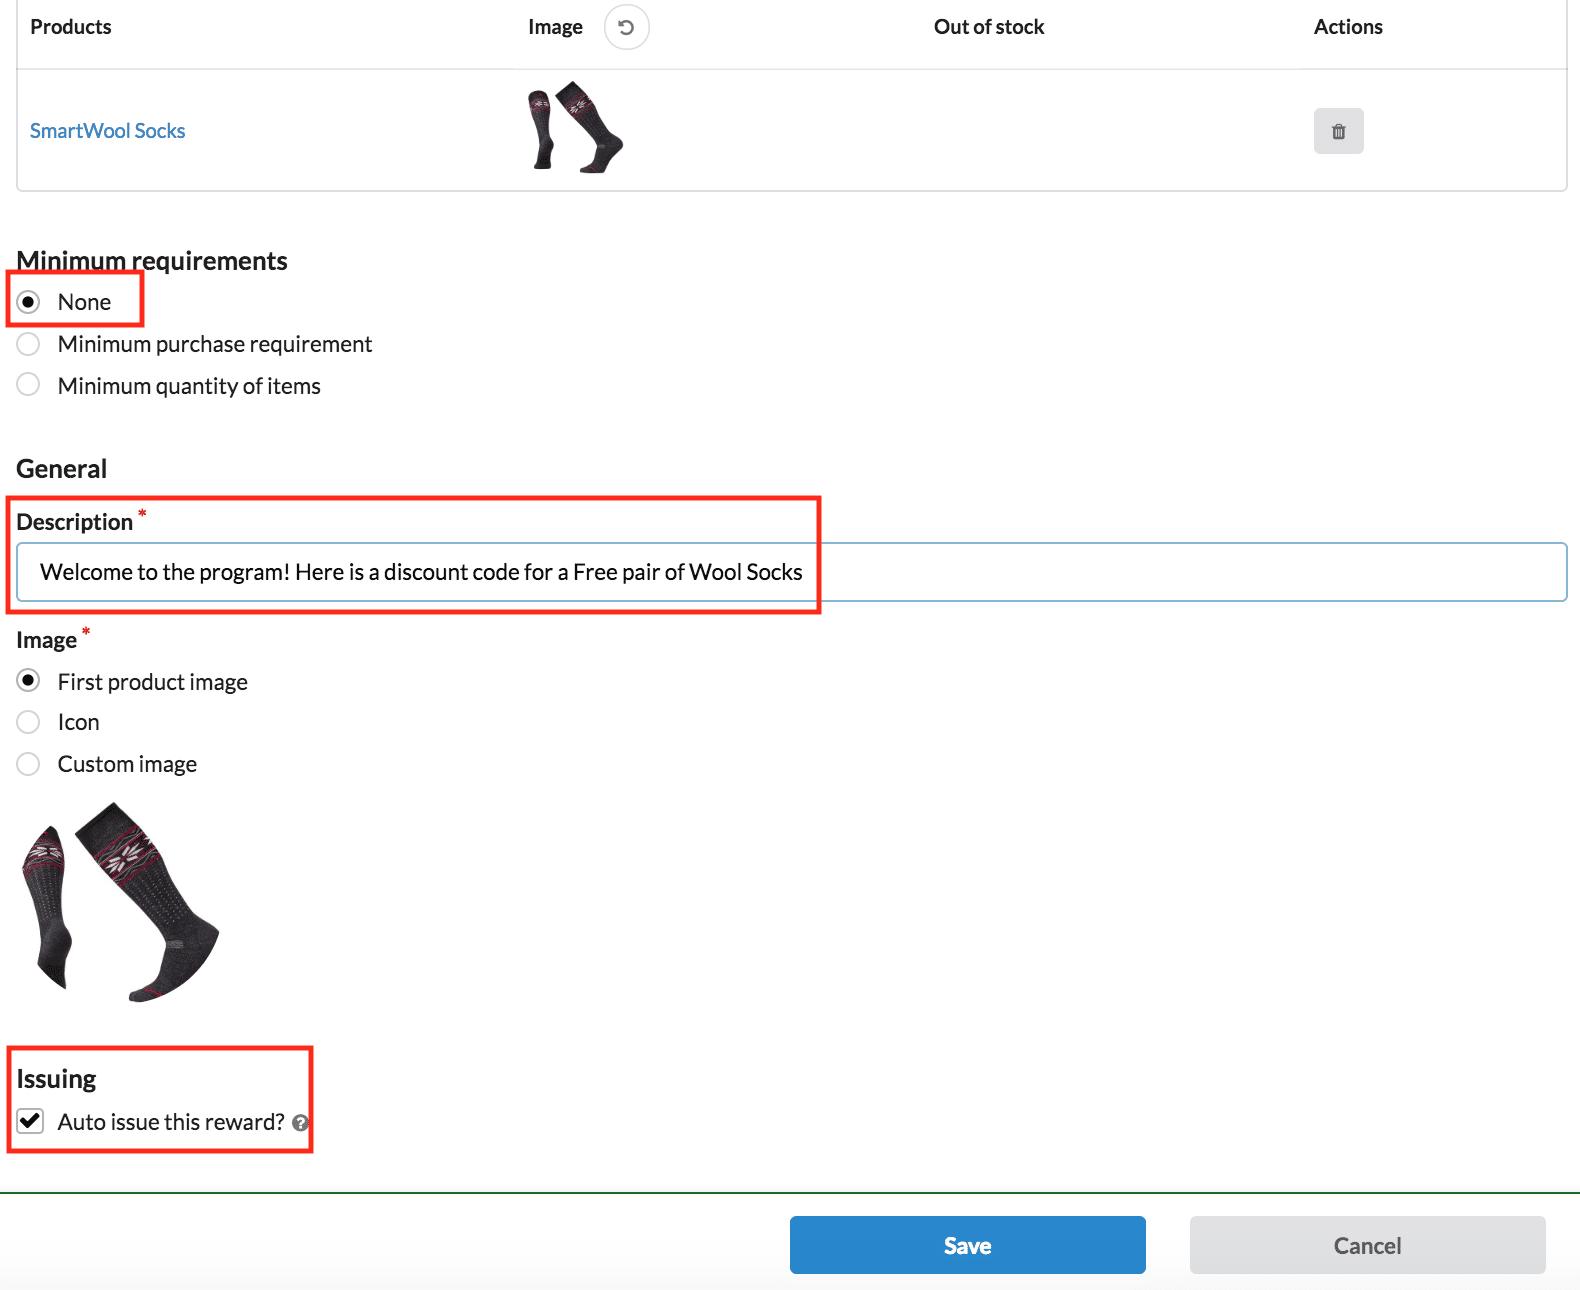 Configuration ambassador reward settings minimum requirements description image